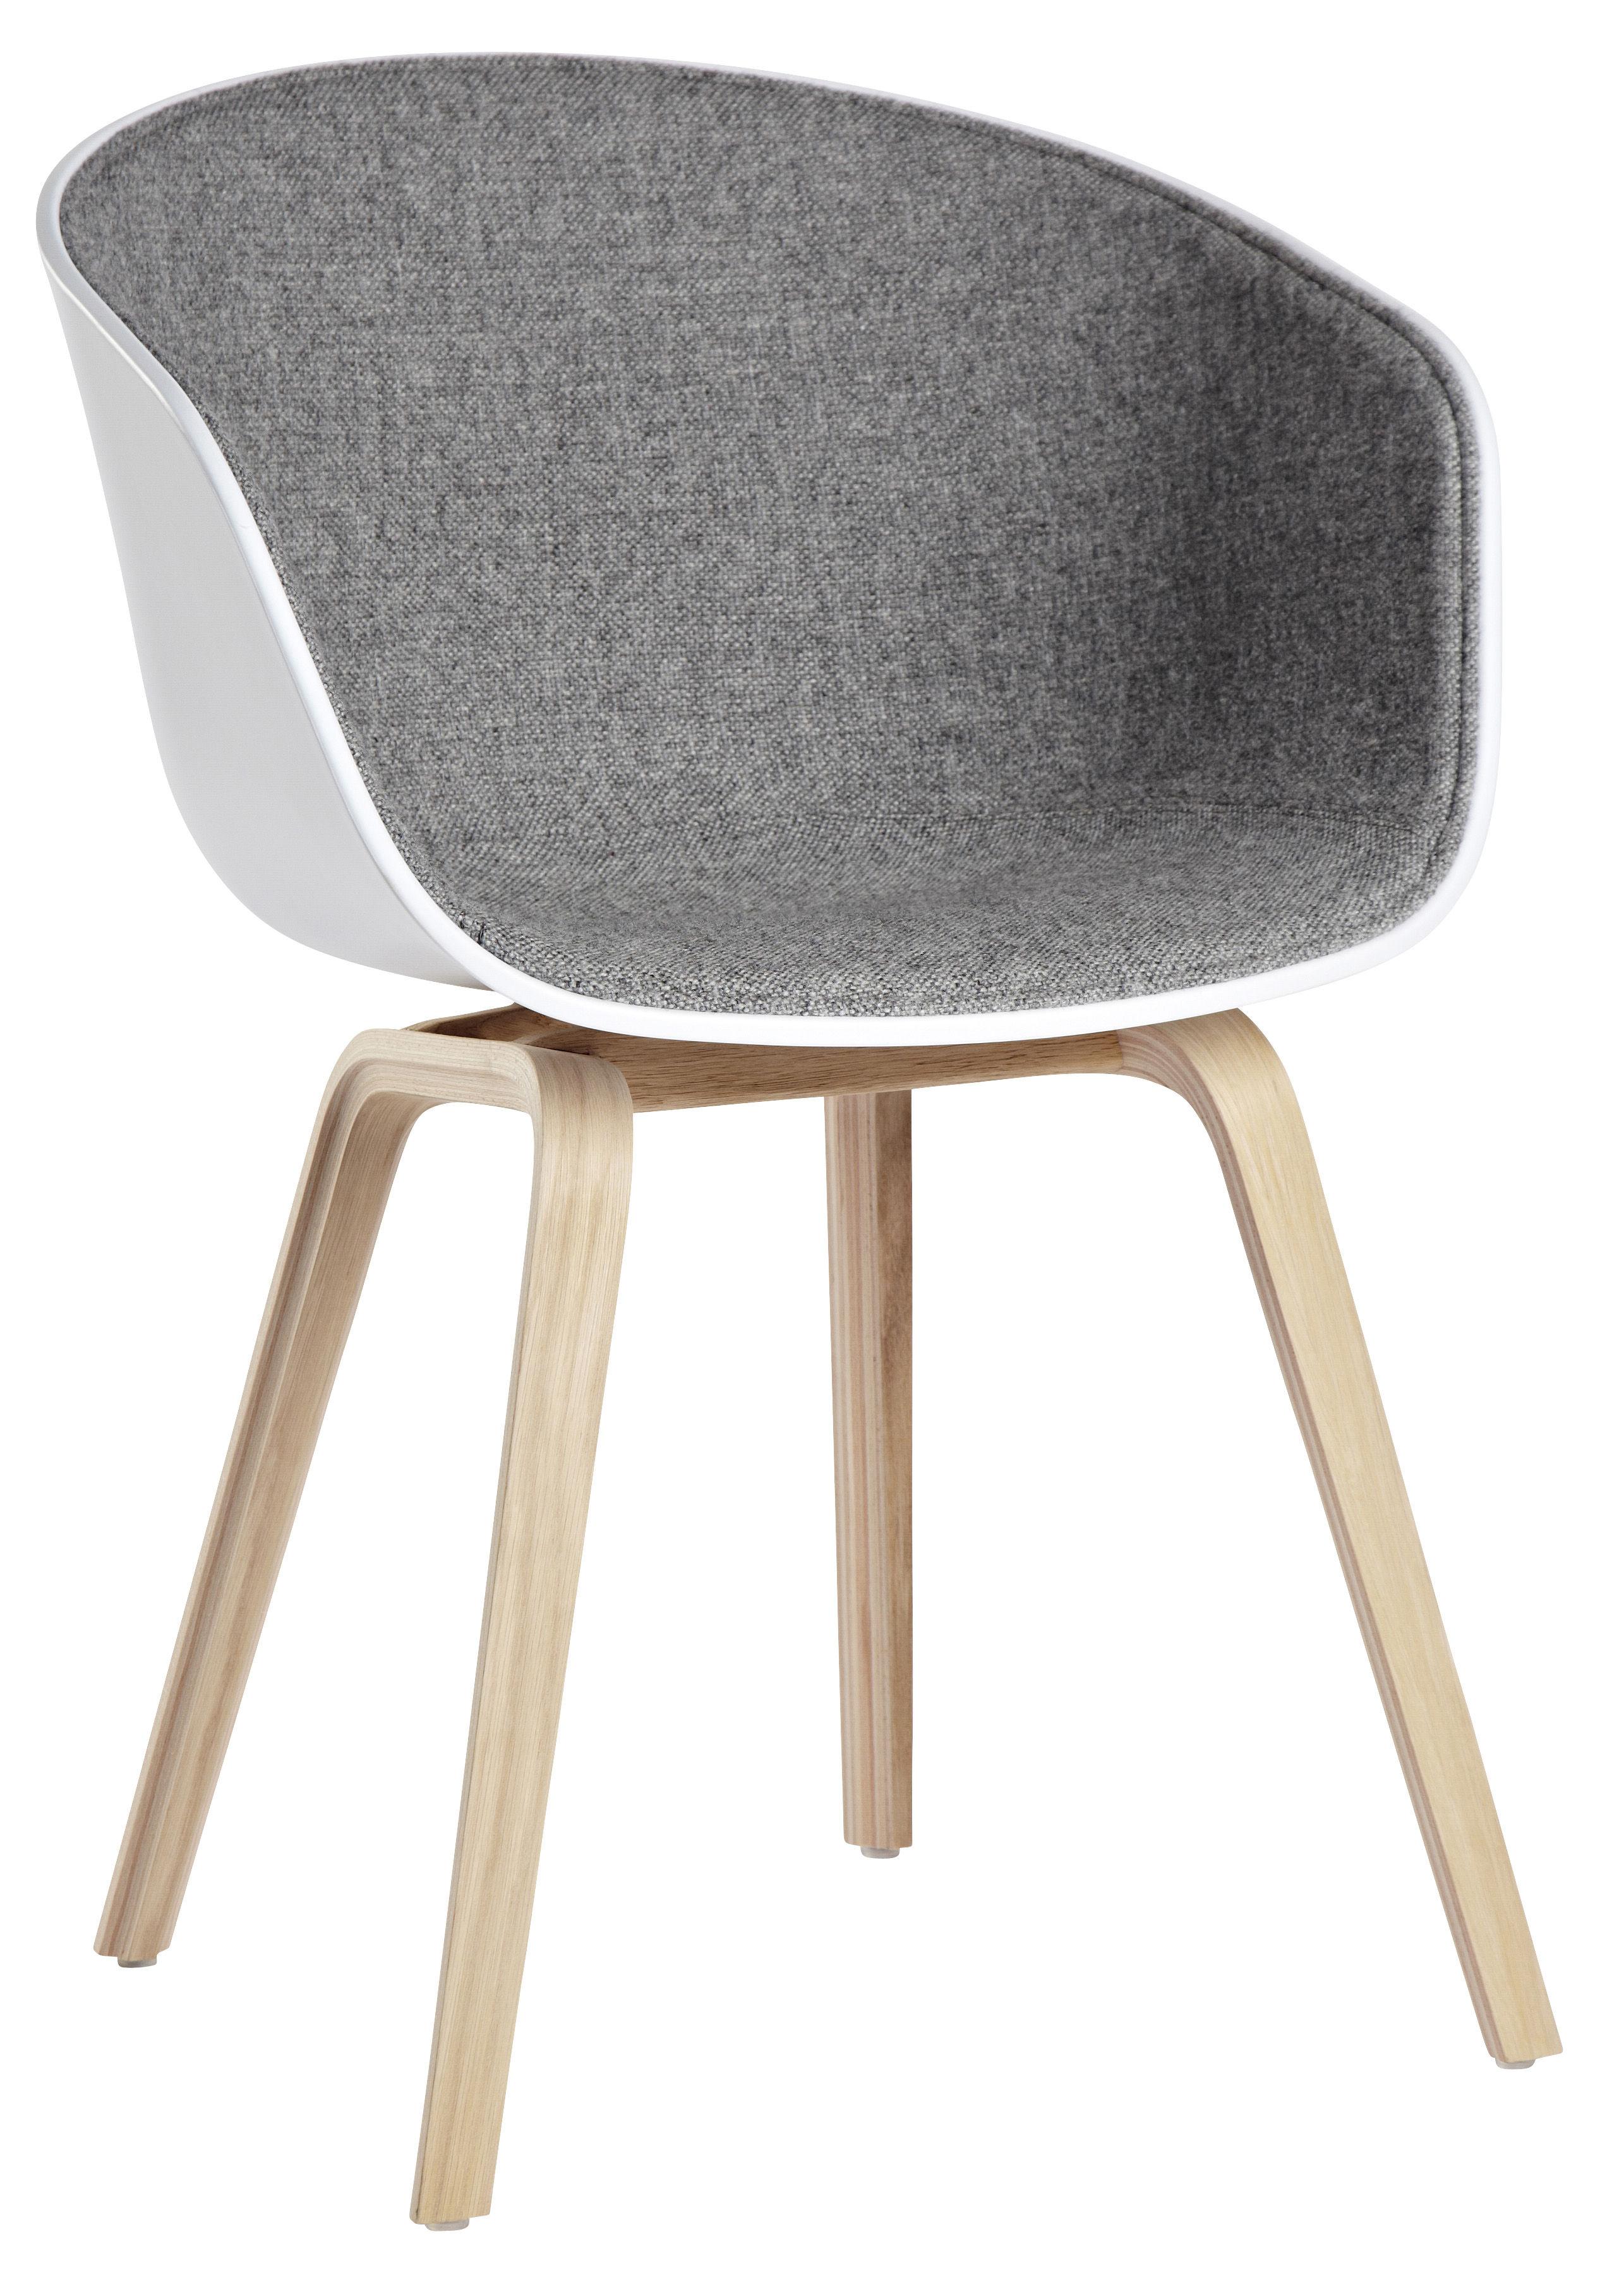 Fauteuil Rembourr About A Chair AAC22 Tissu Intrieur Pieds Bois